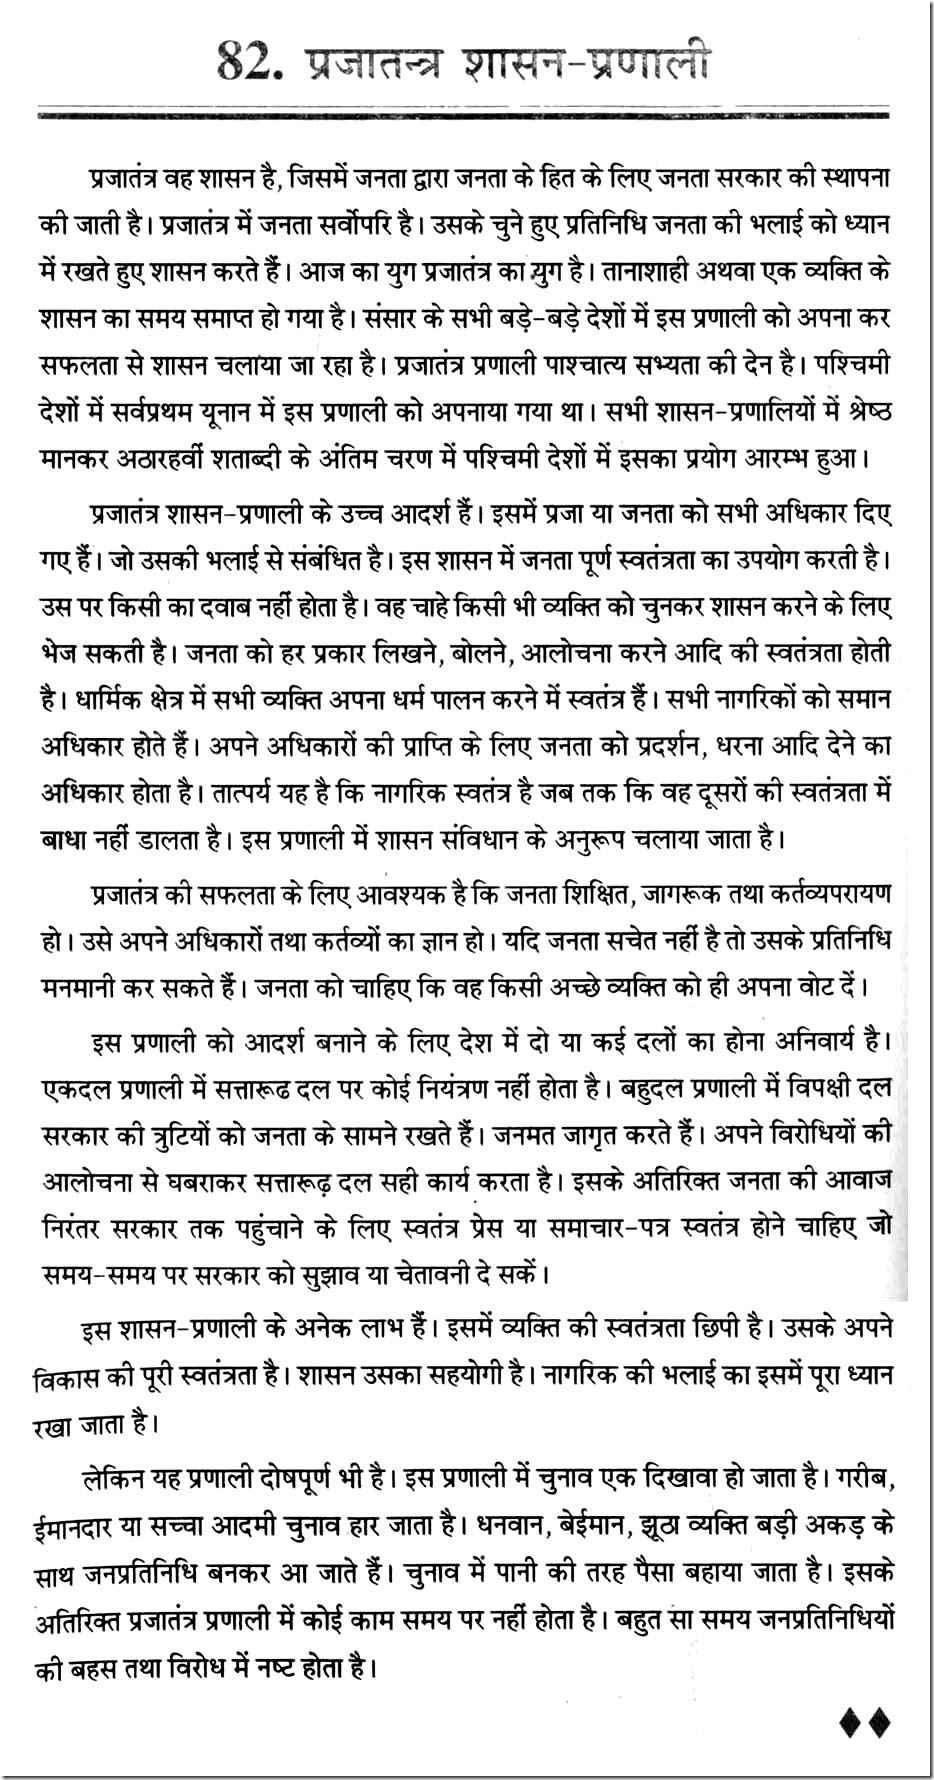 011 Essay Importance Democracy Thumb Of Voting Pdf In Kannada The Essays English Tamil Rights India Hindi On Punjabi Persuasive Unforgettable Marathi Full